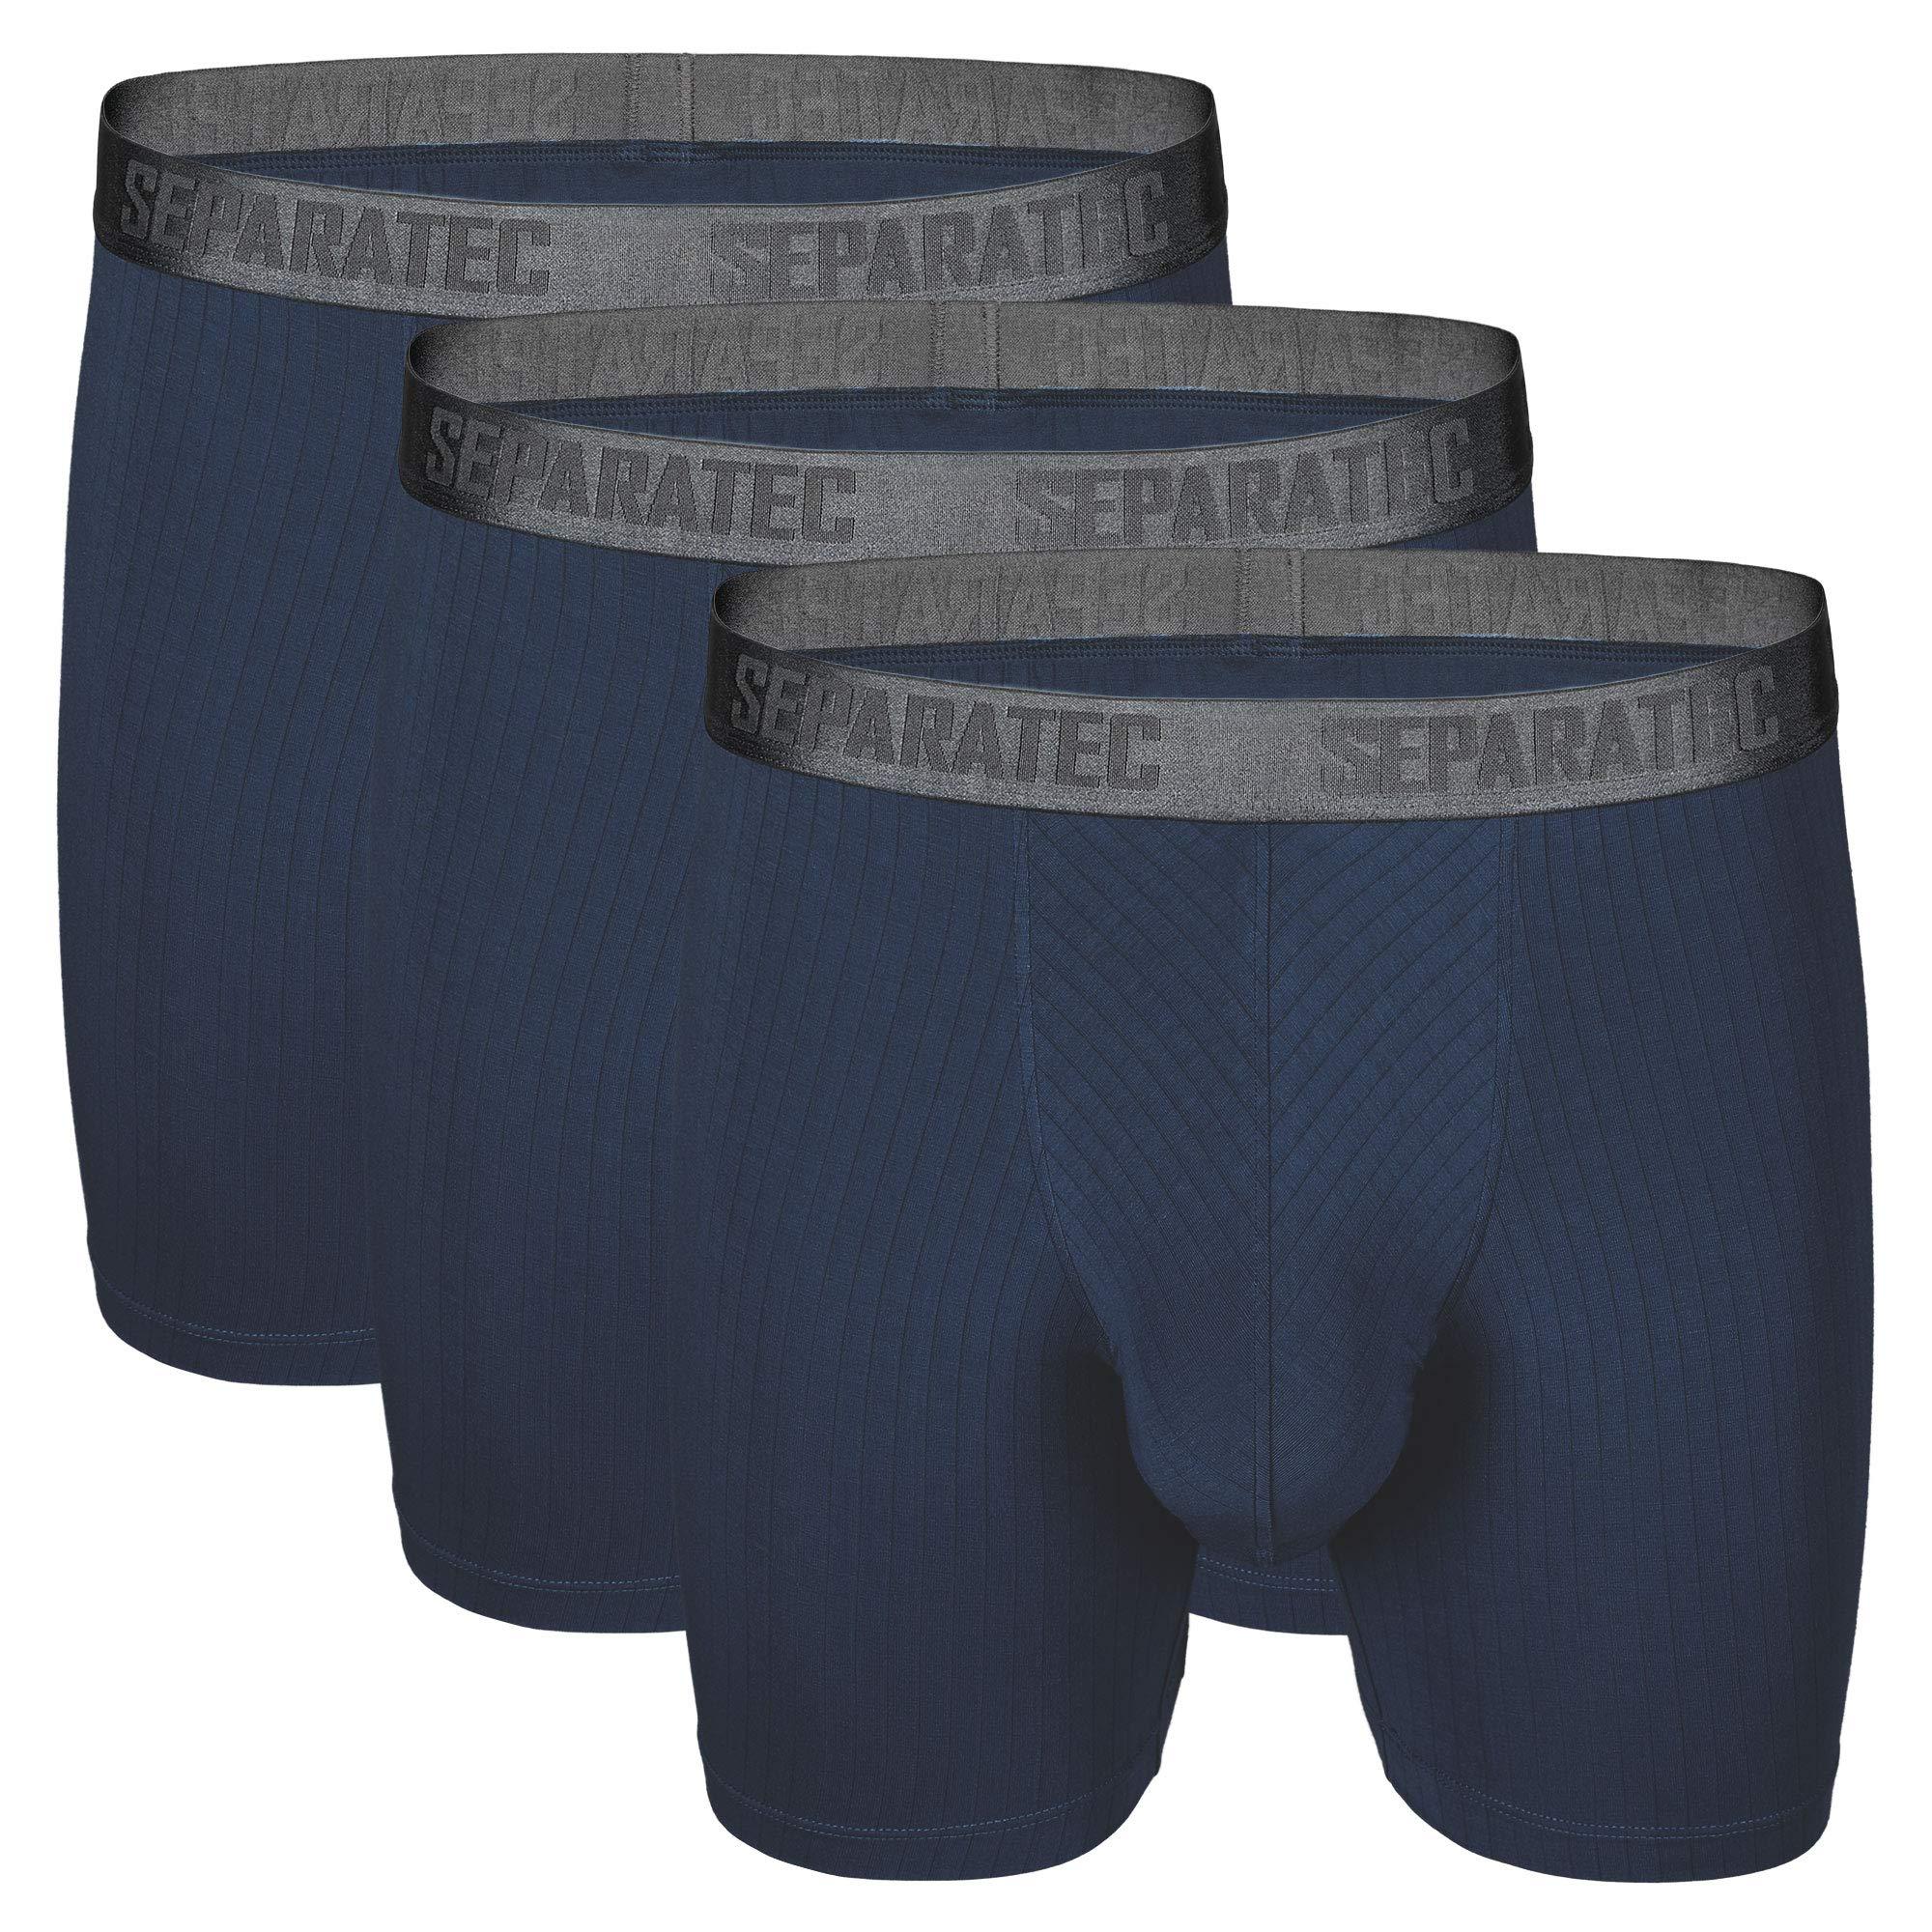 Separatec Men's 3 Pack Soft Modal Stylish Drop Needle Striped Boxer Briefs Underwear(L,Navy Blue) by Separatec (Image #1)